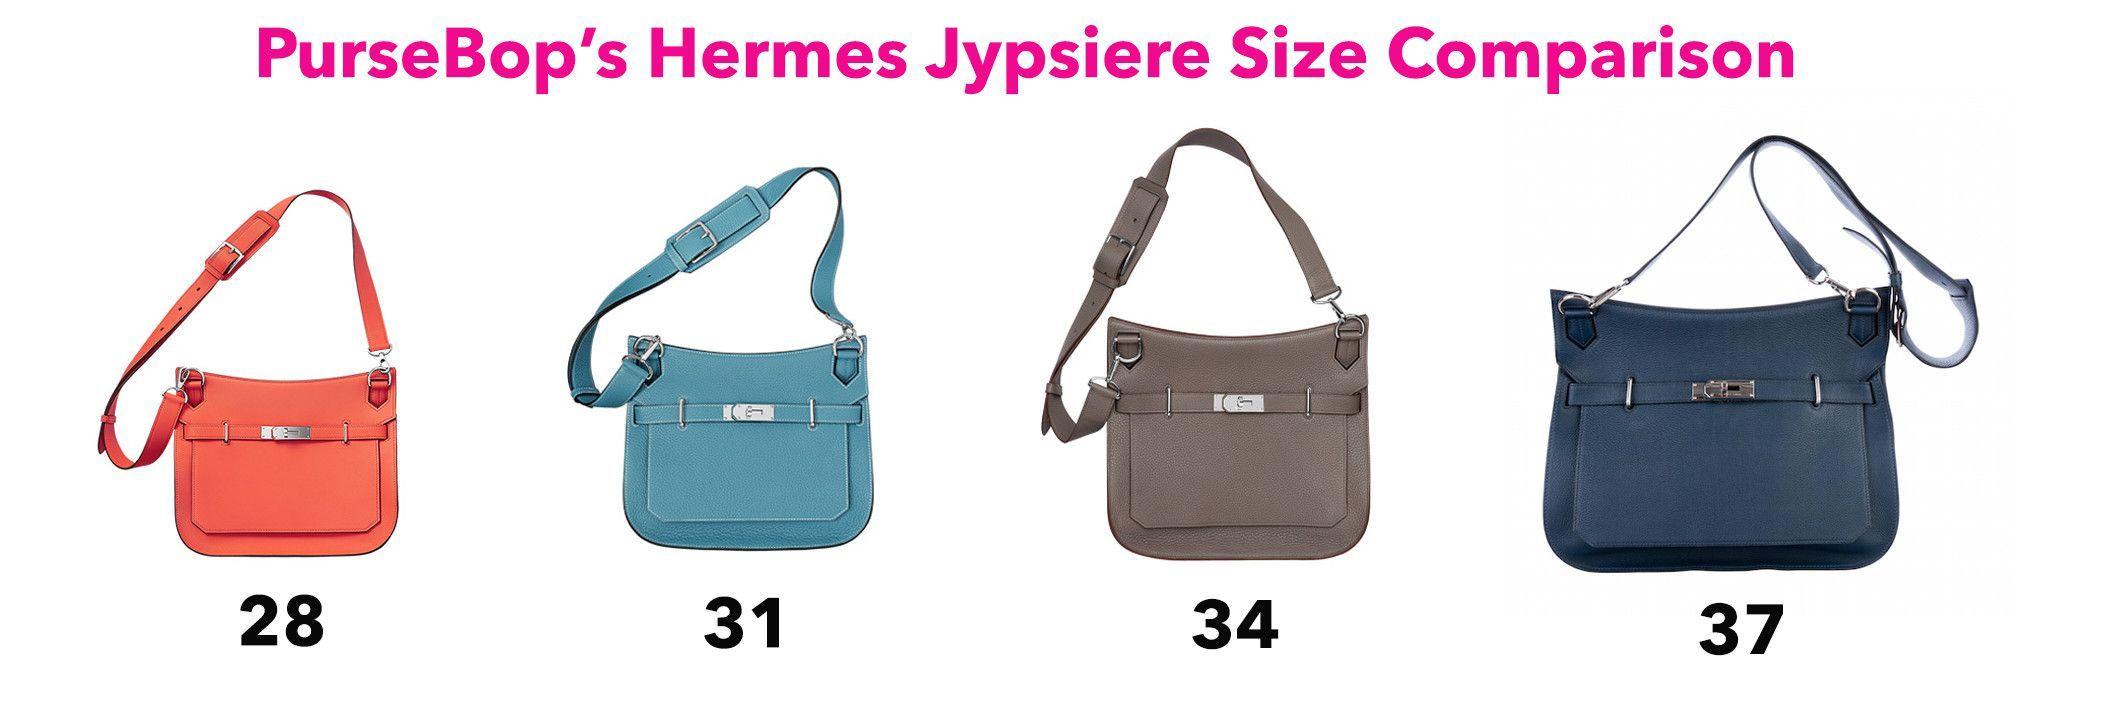 best quality hermes birkin replica - Hermes Highlight: Hermes Jypsiere Reference Guide - PurseBop